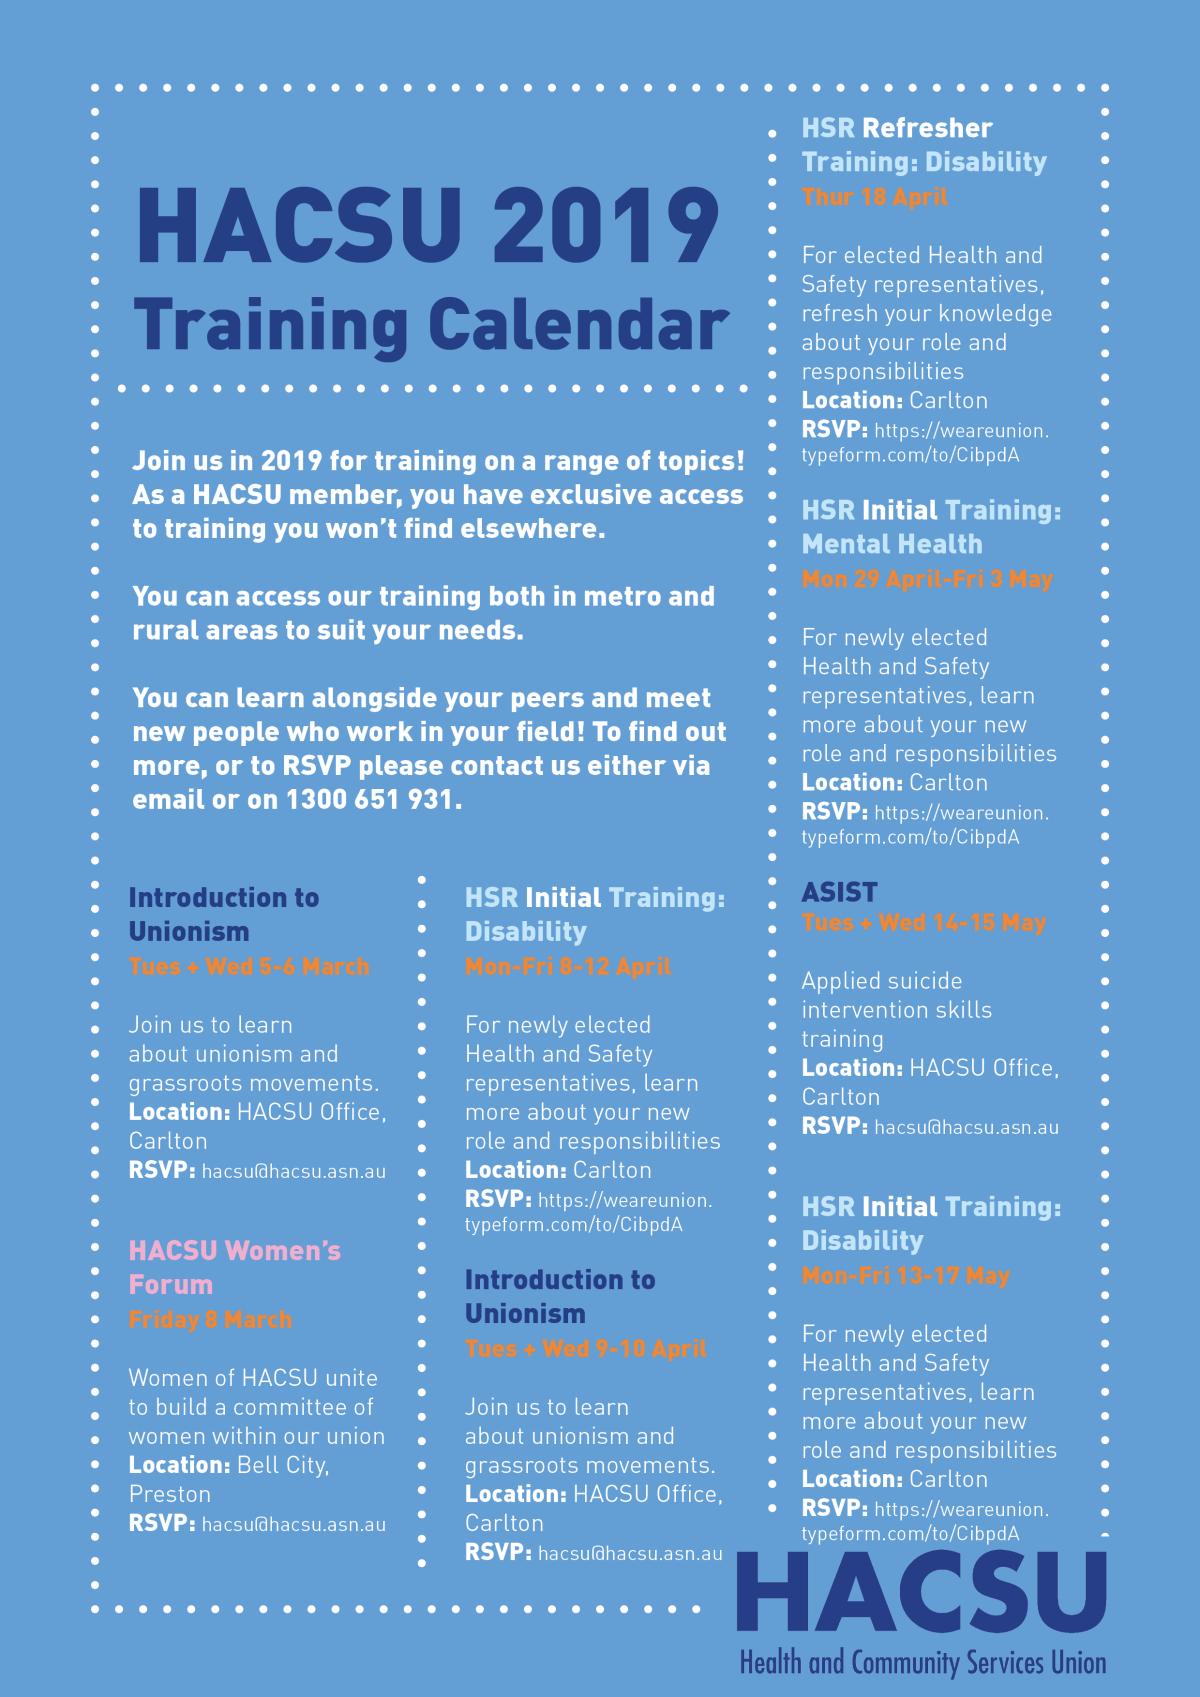 2019 Training Calendar